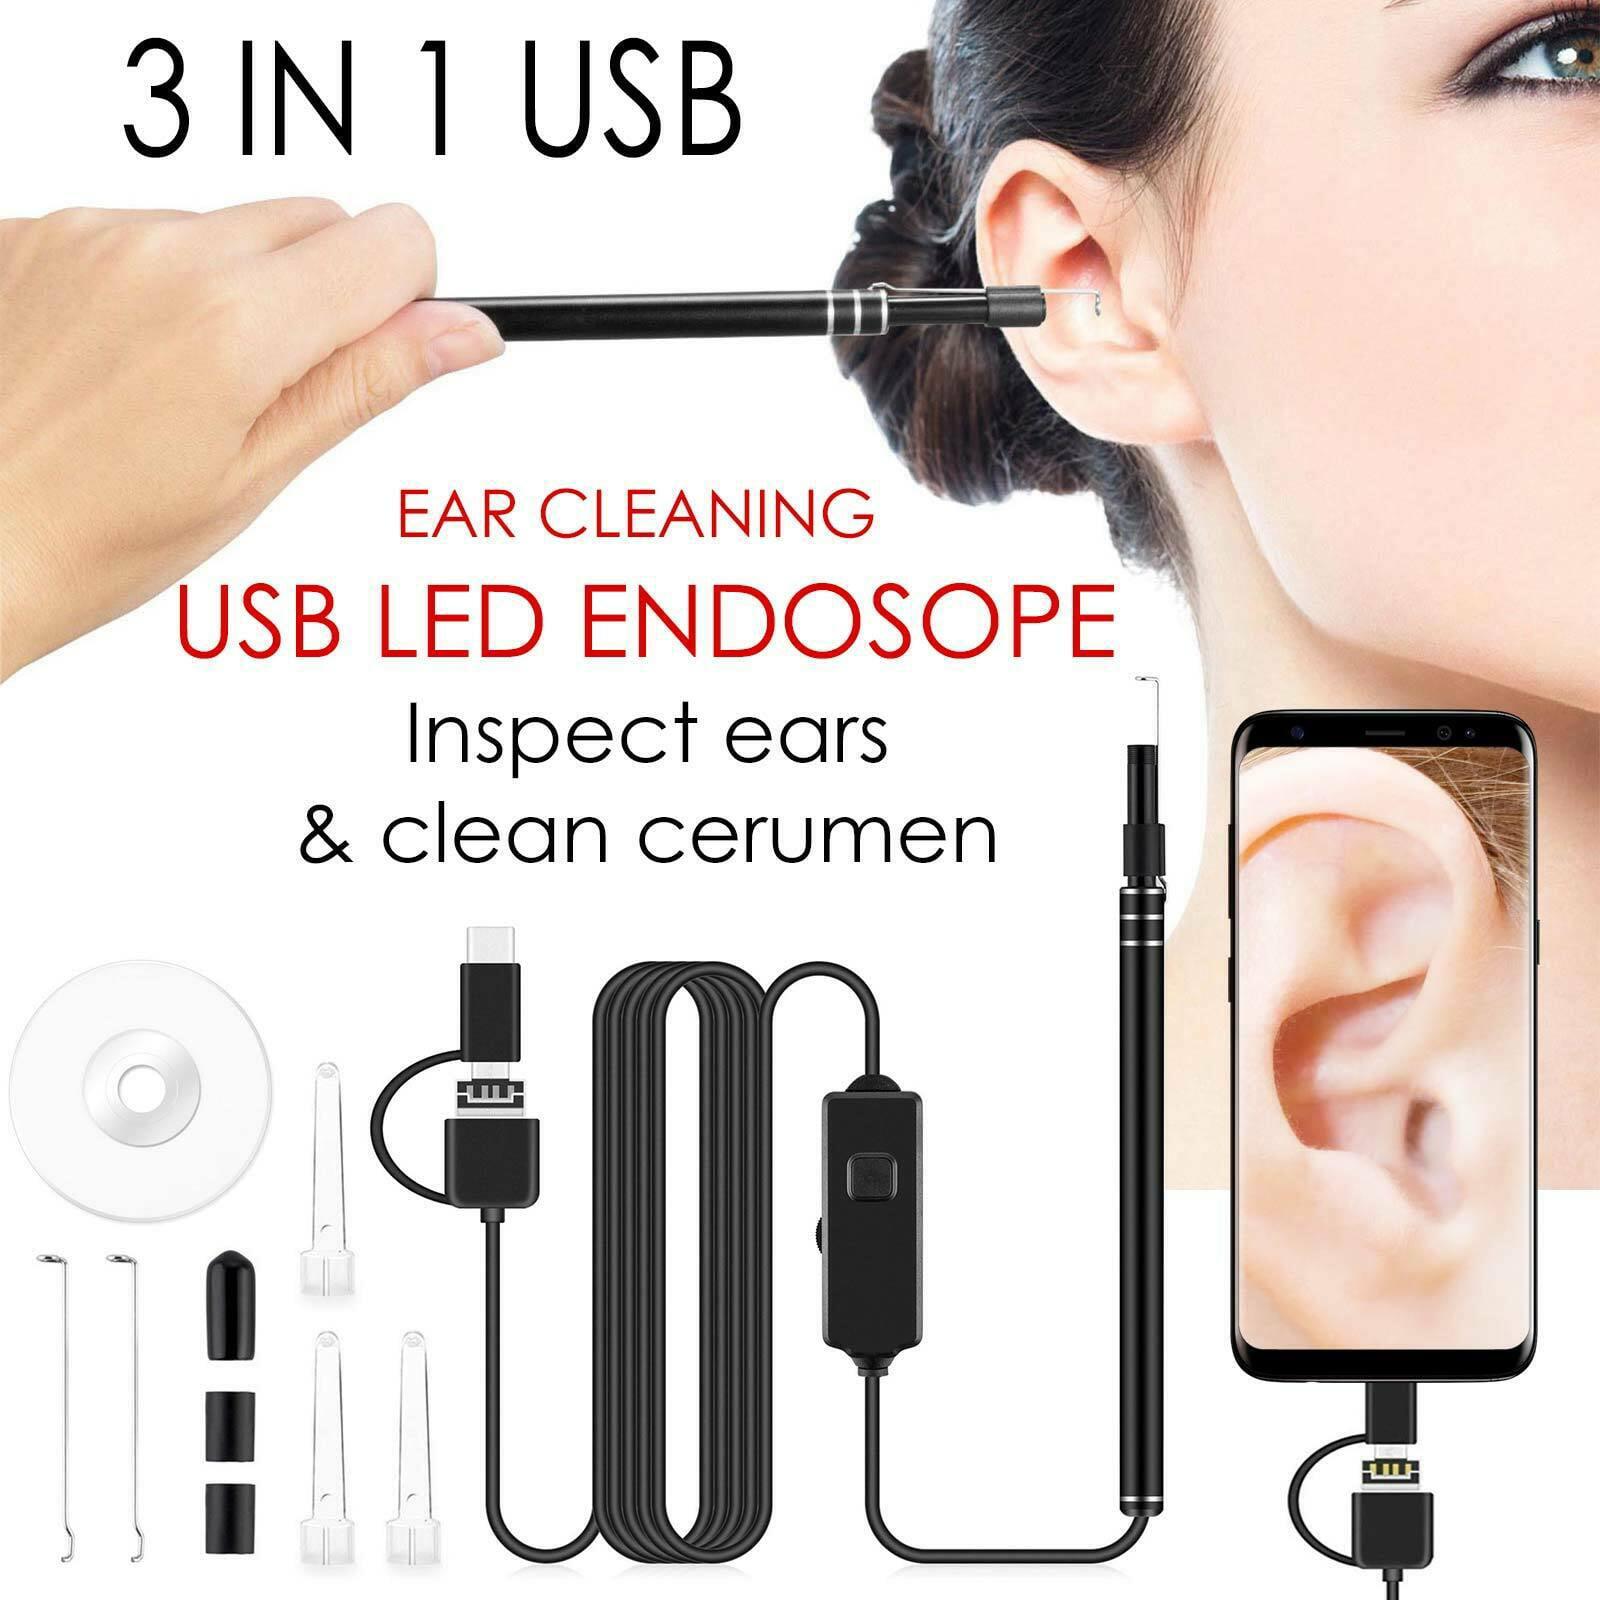 LED Endoscope Otoscope Ear Nasal Dental Intraoral Digital Camera Scope Earwax Removal Kit Ear Wax Cleaning Tool